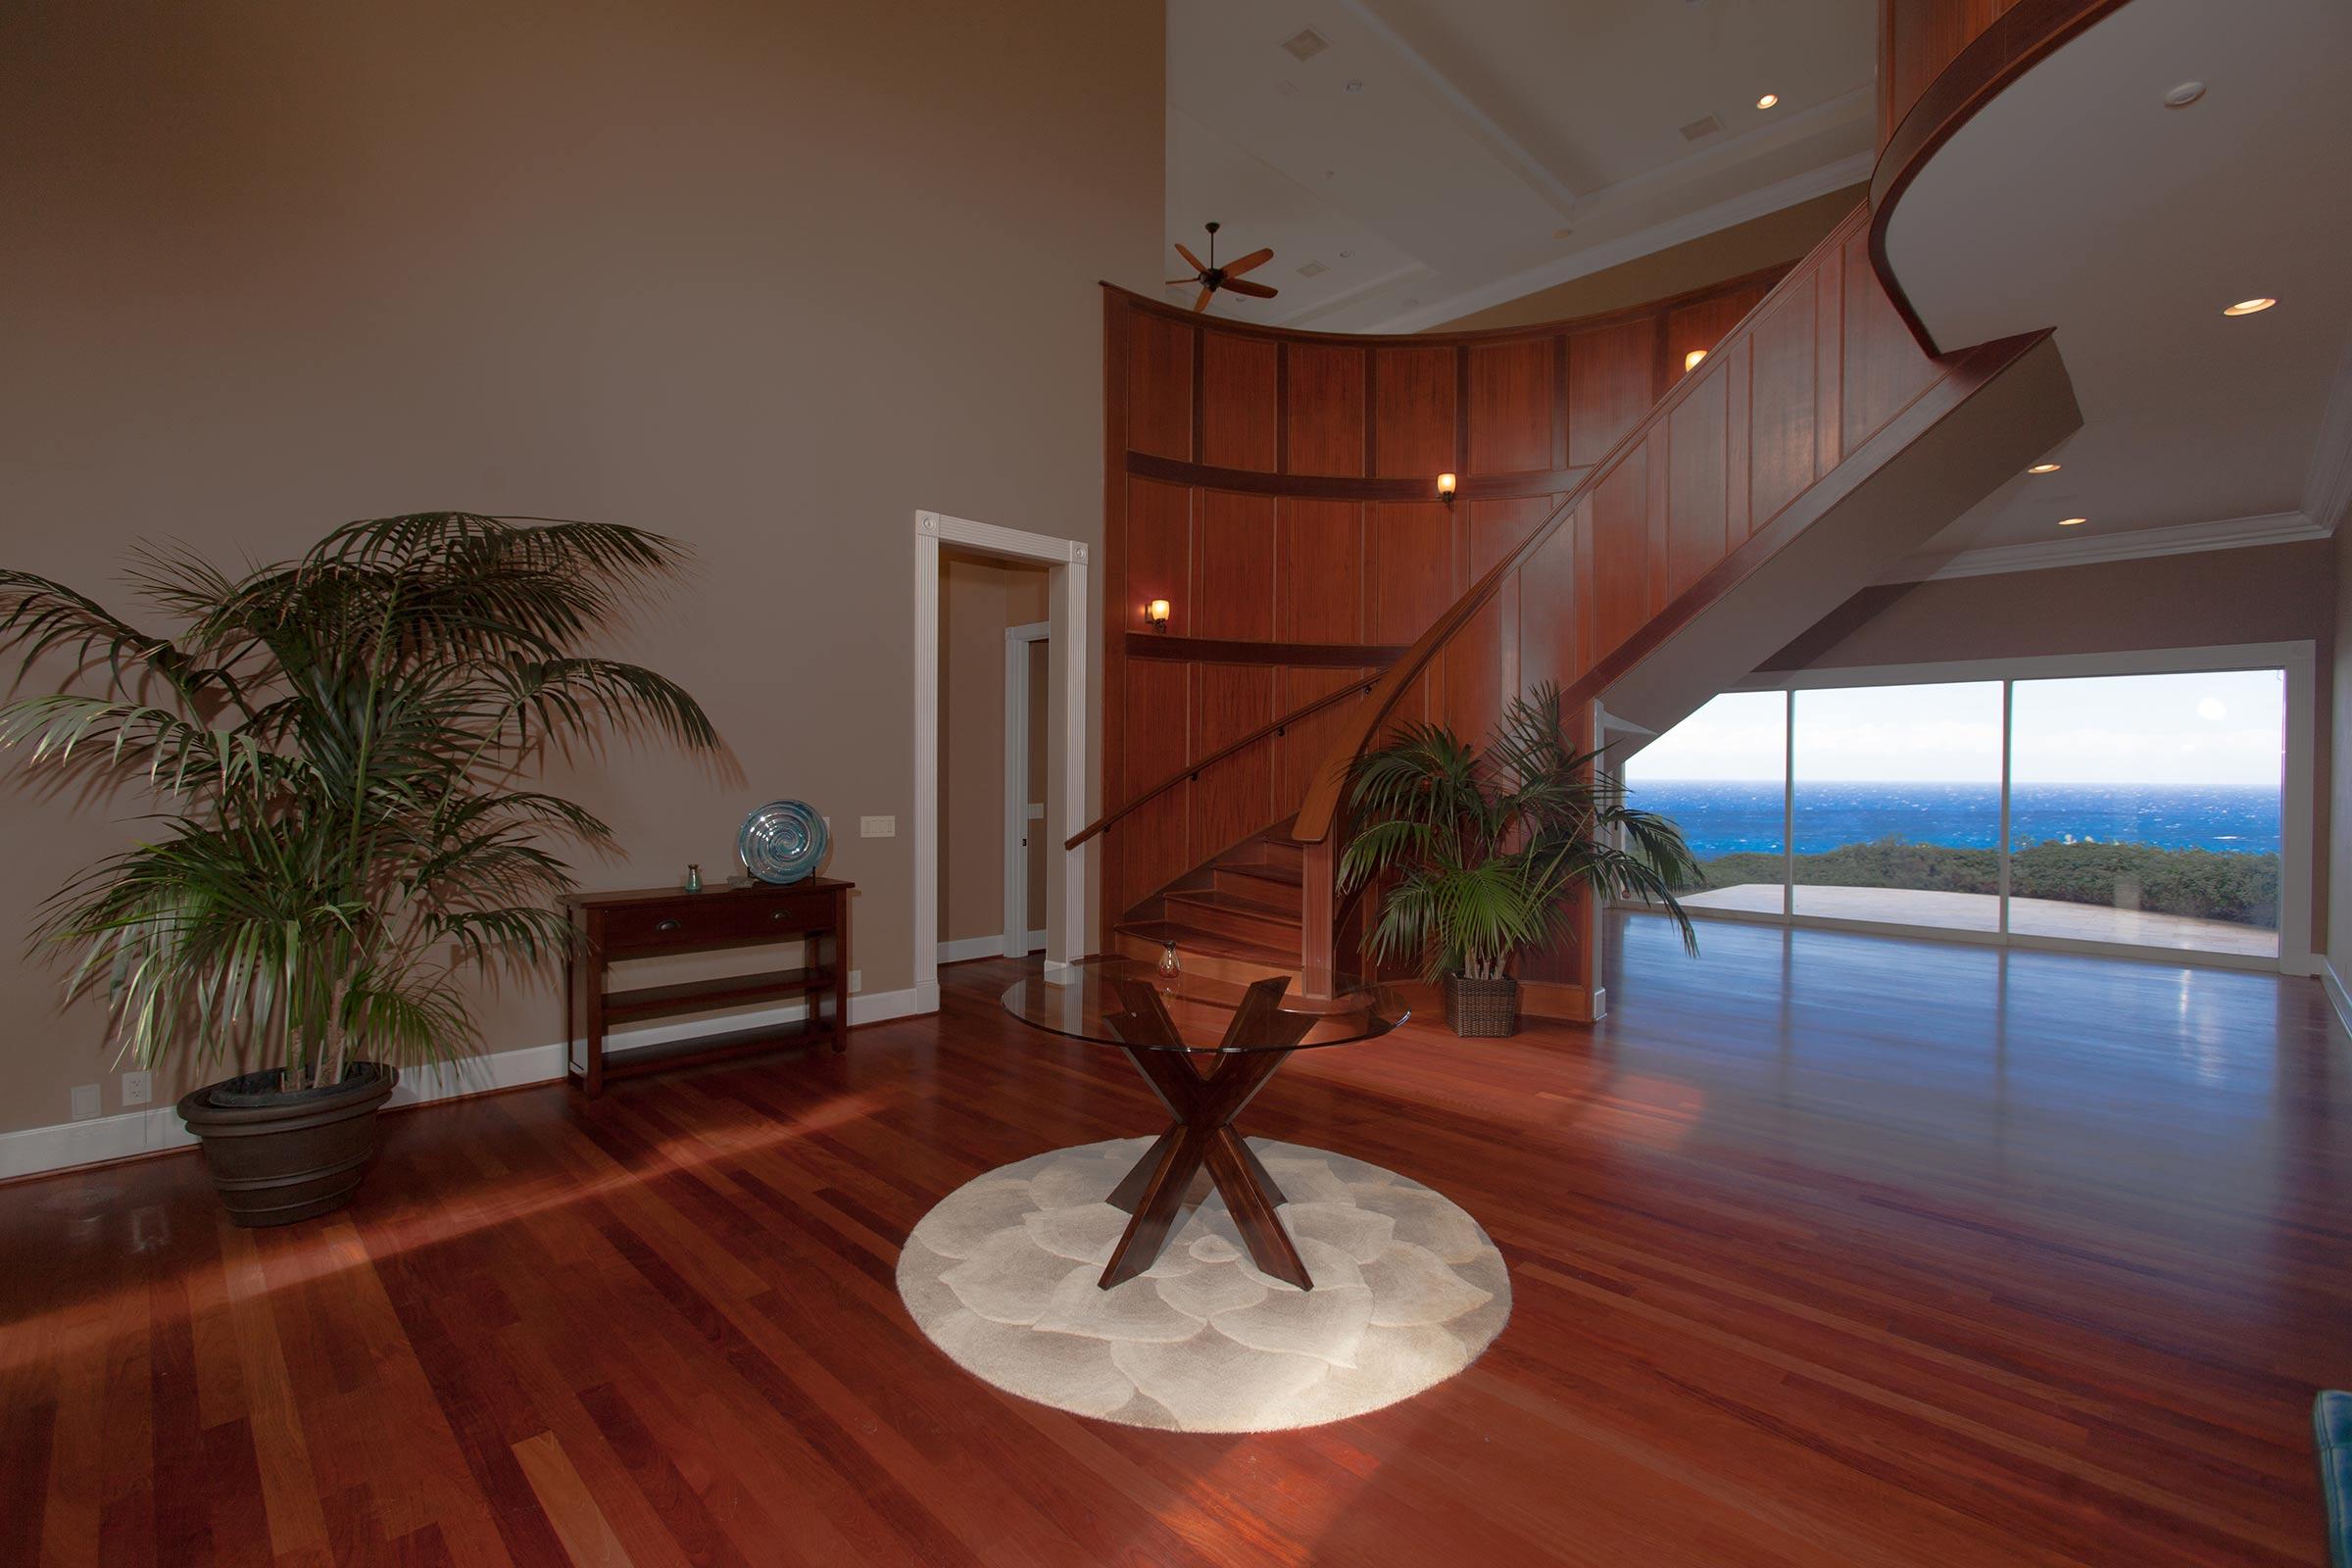 real-estate-photographer-033.jpg